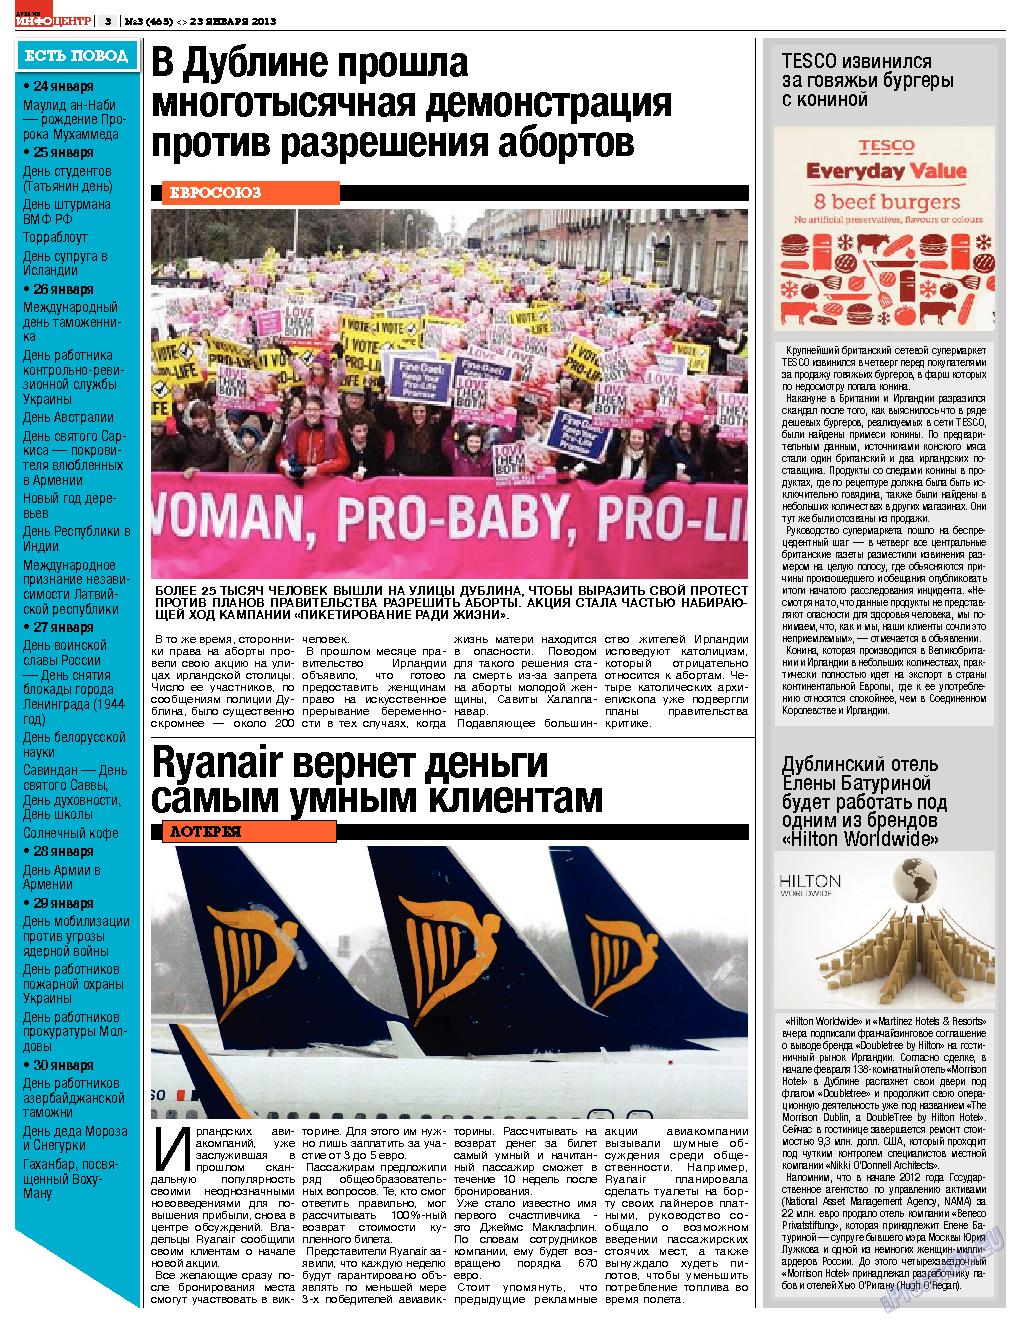 Дублин инфоцентр (газета). 2013 год, номер 3, стр. 3